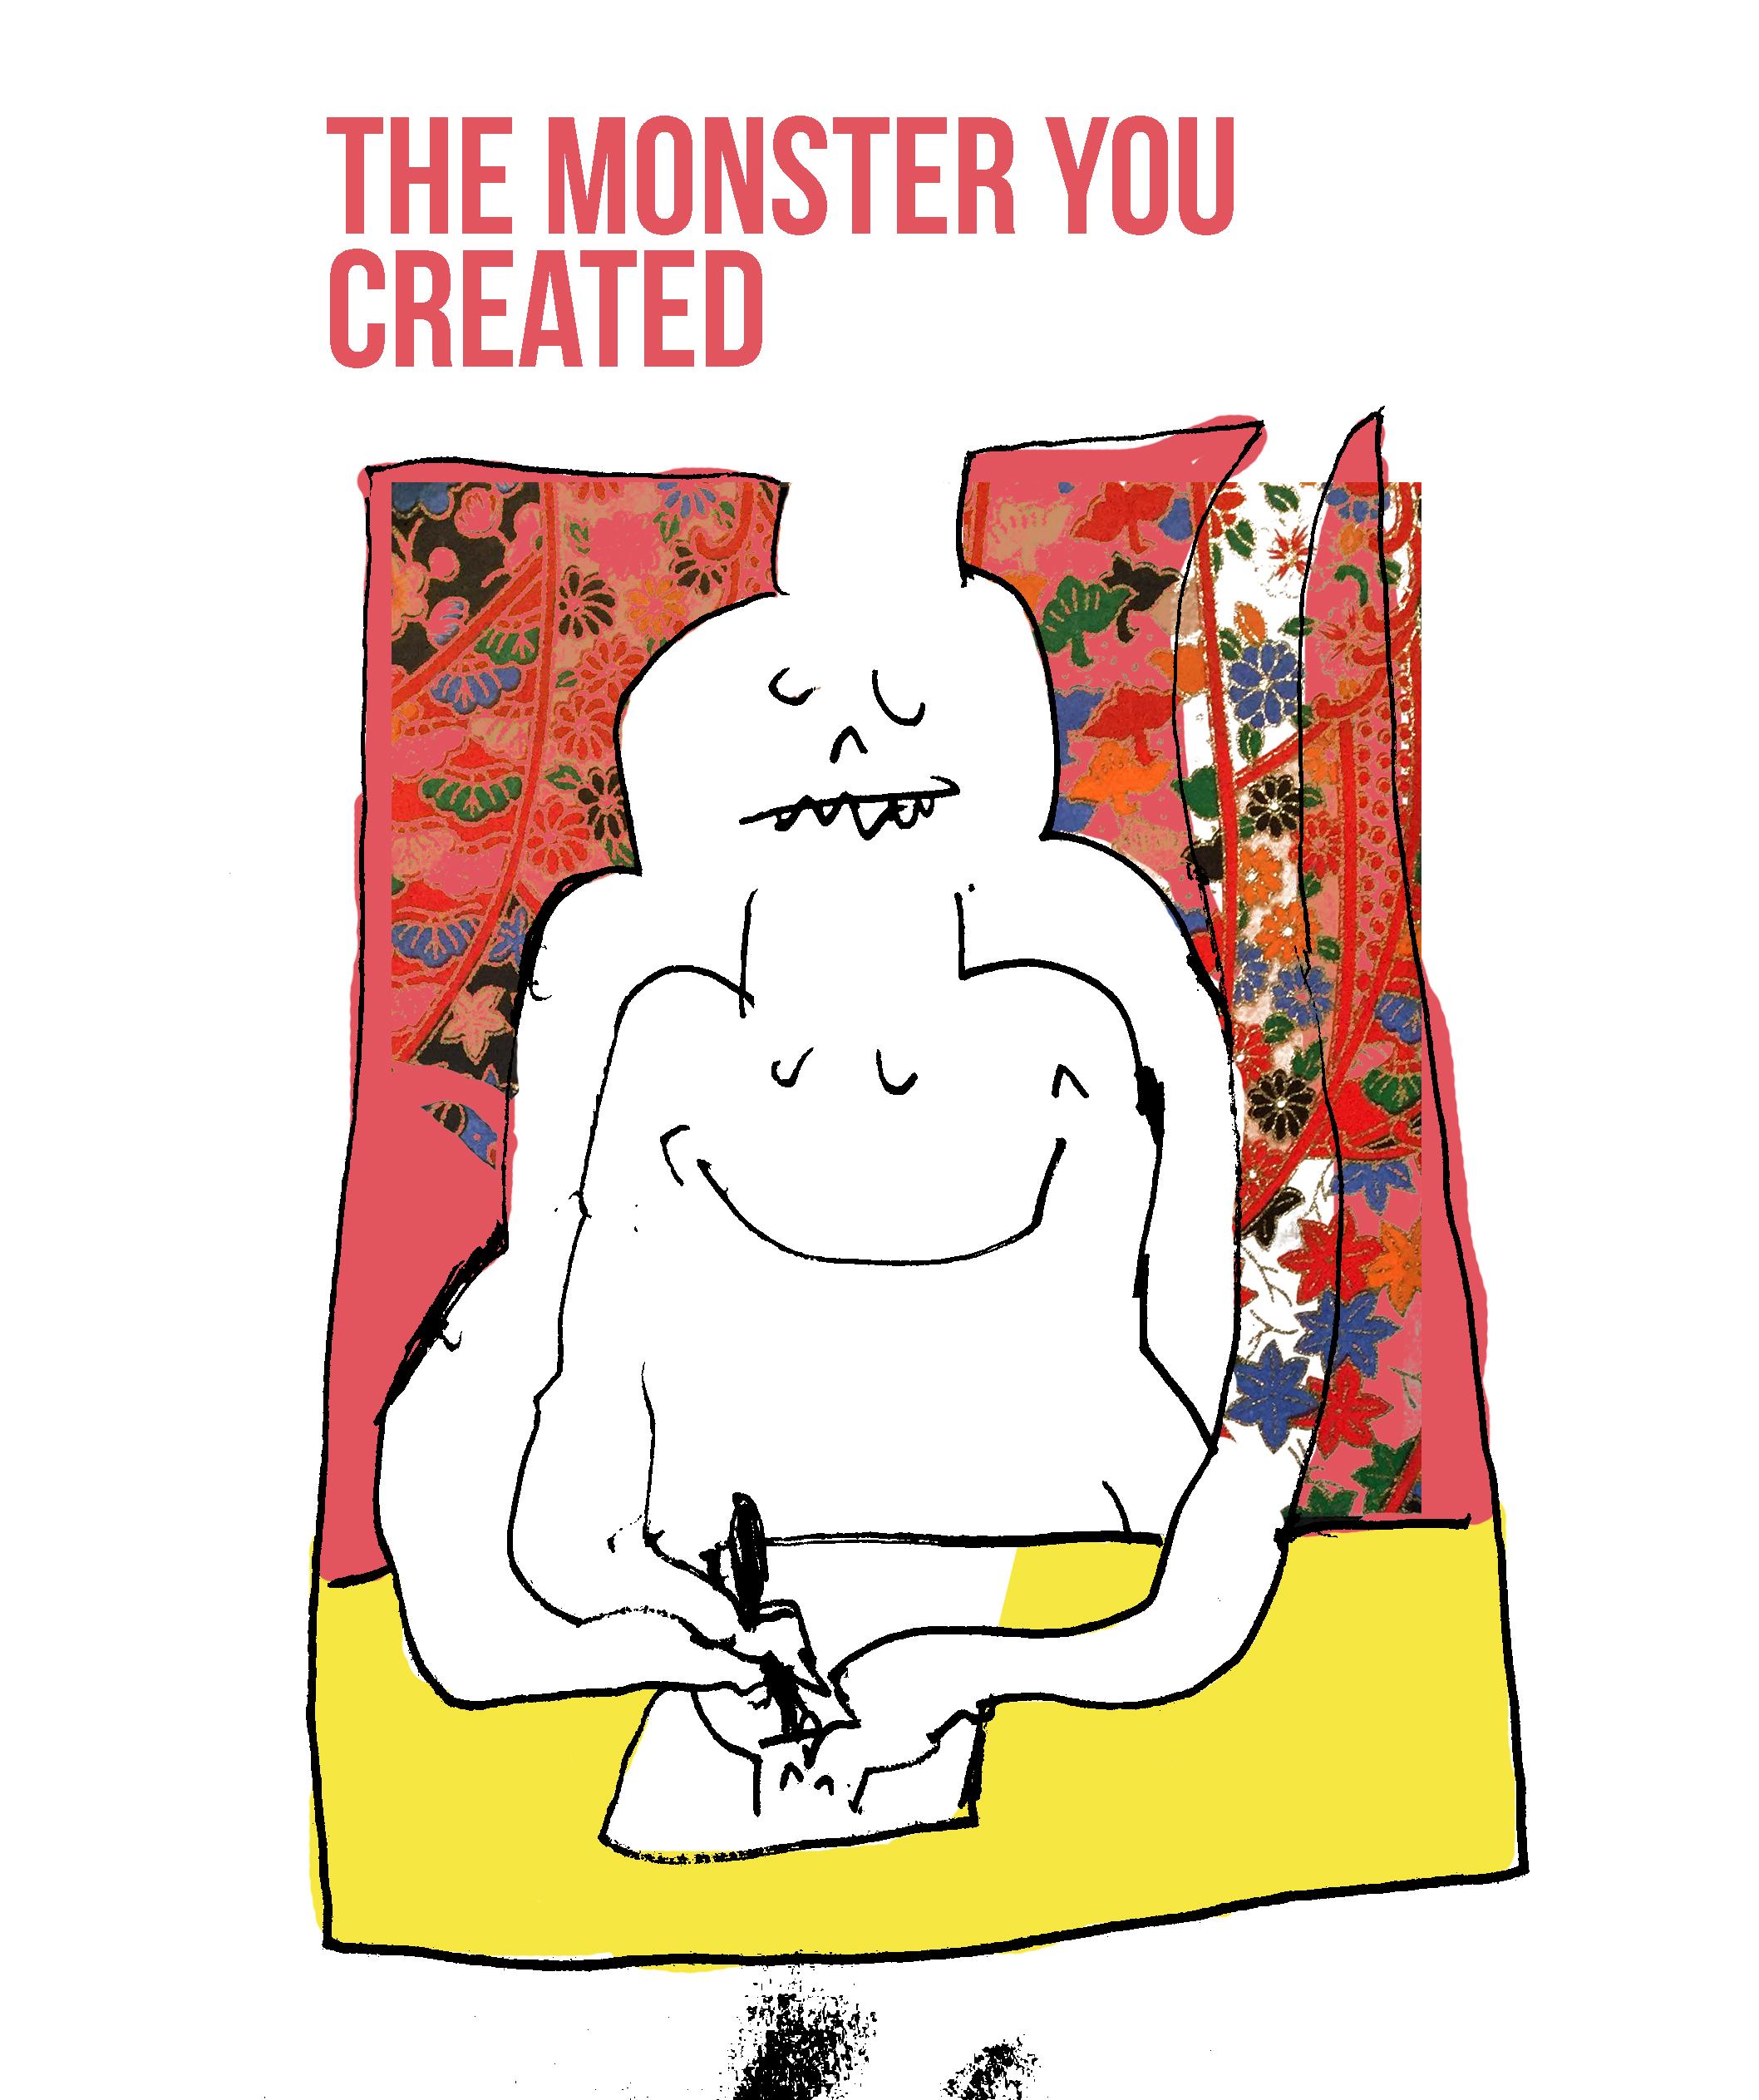 monster created copy.jpg